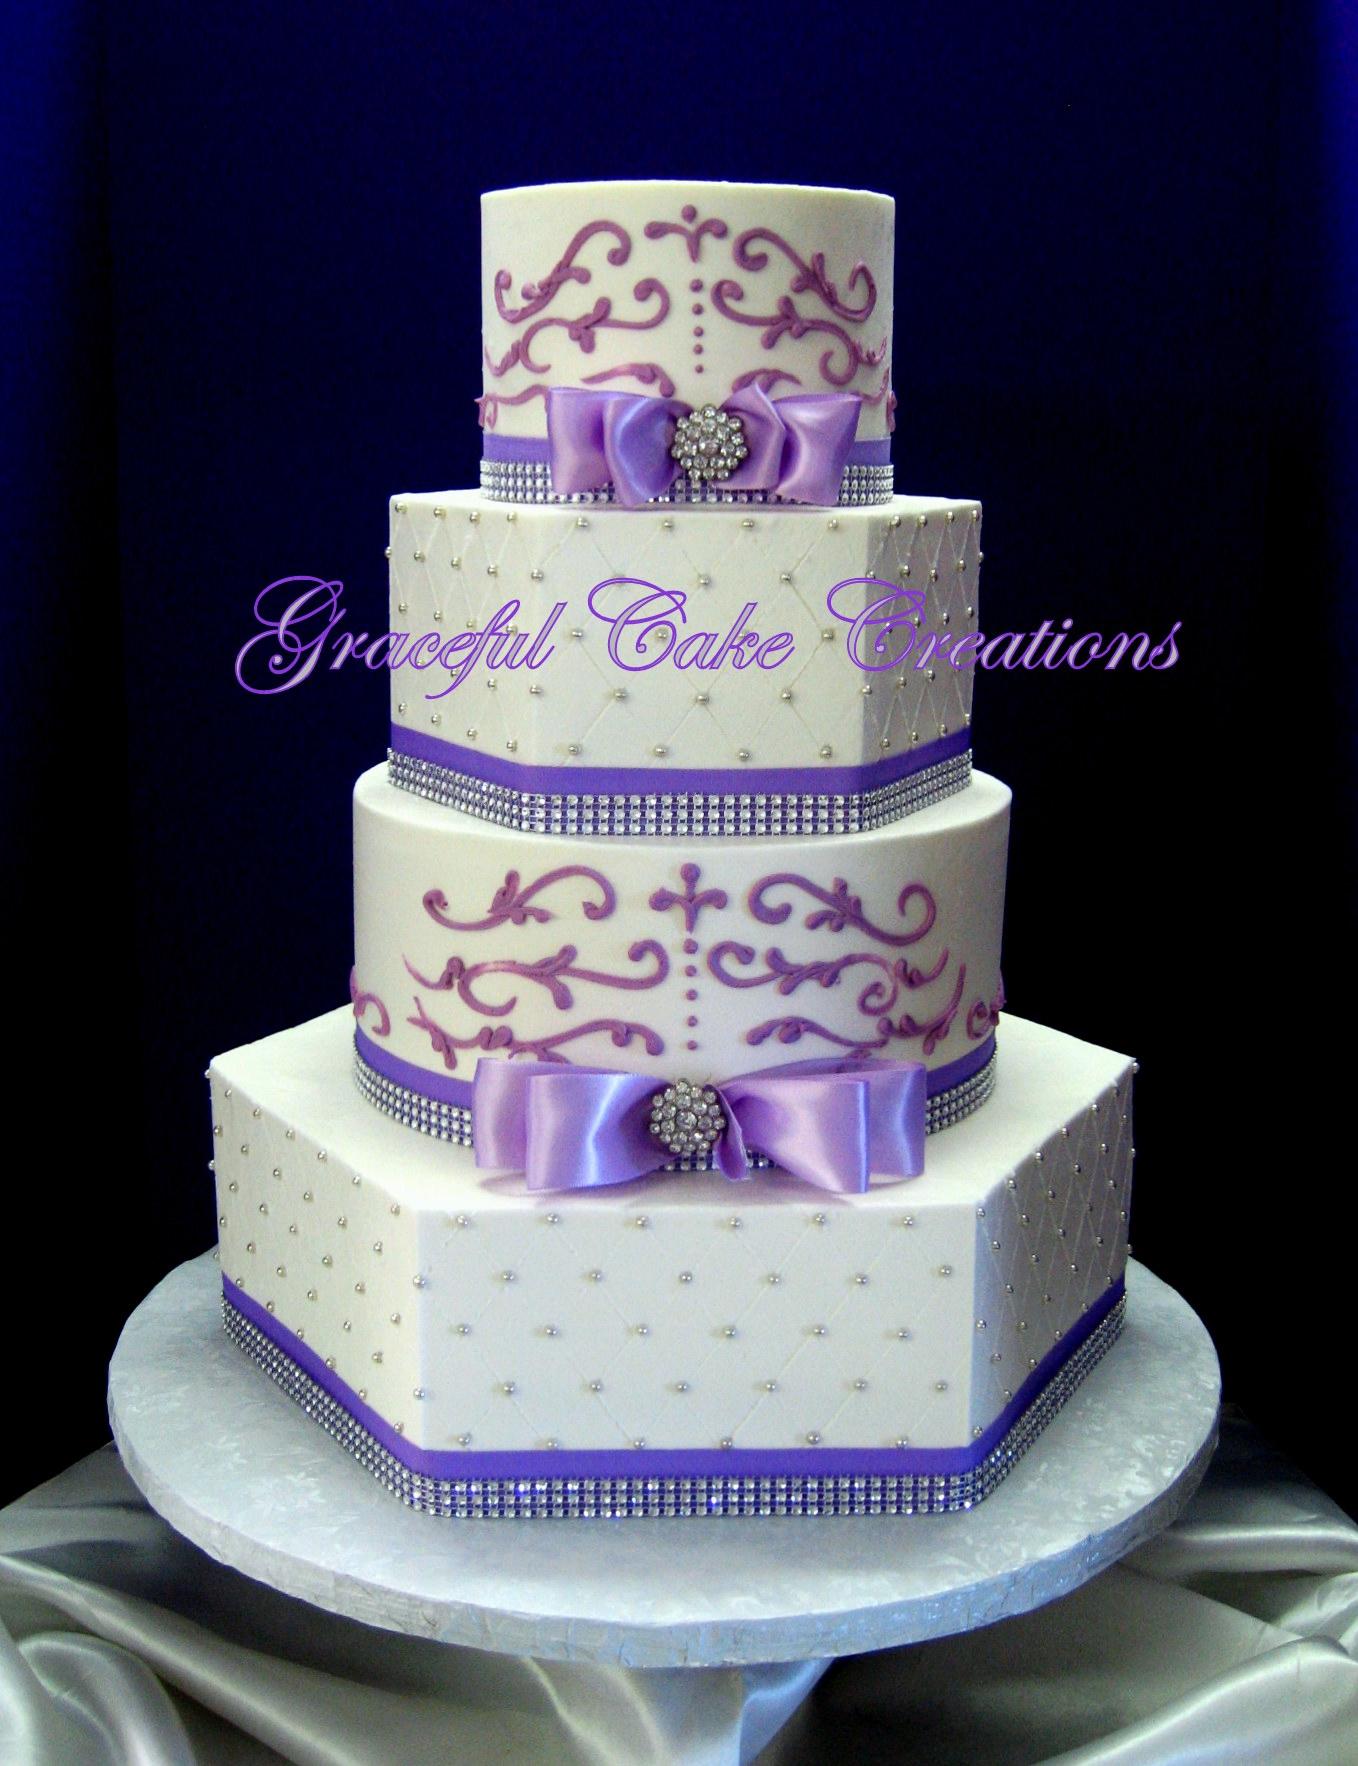 Elegant White and Lavender Wedding Cake with Bling